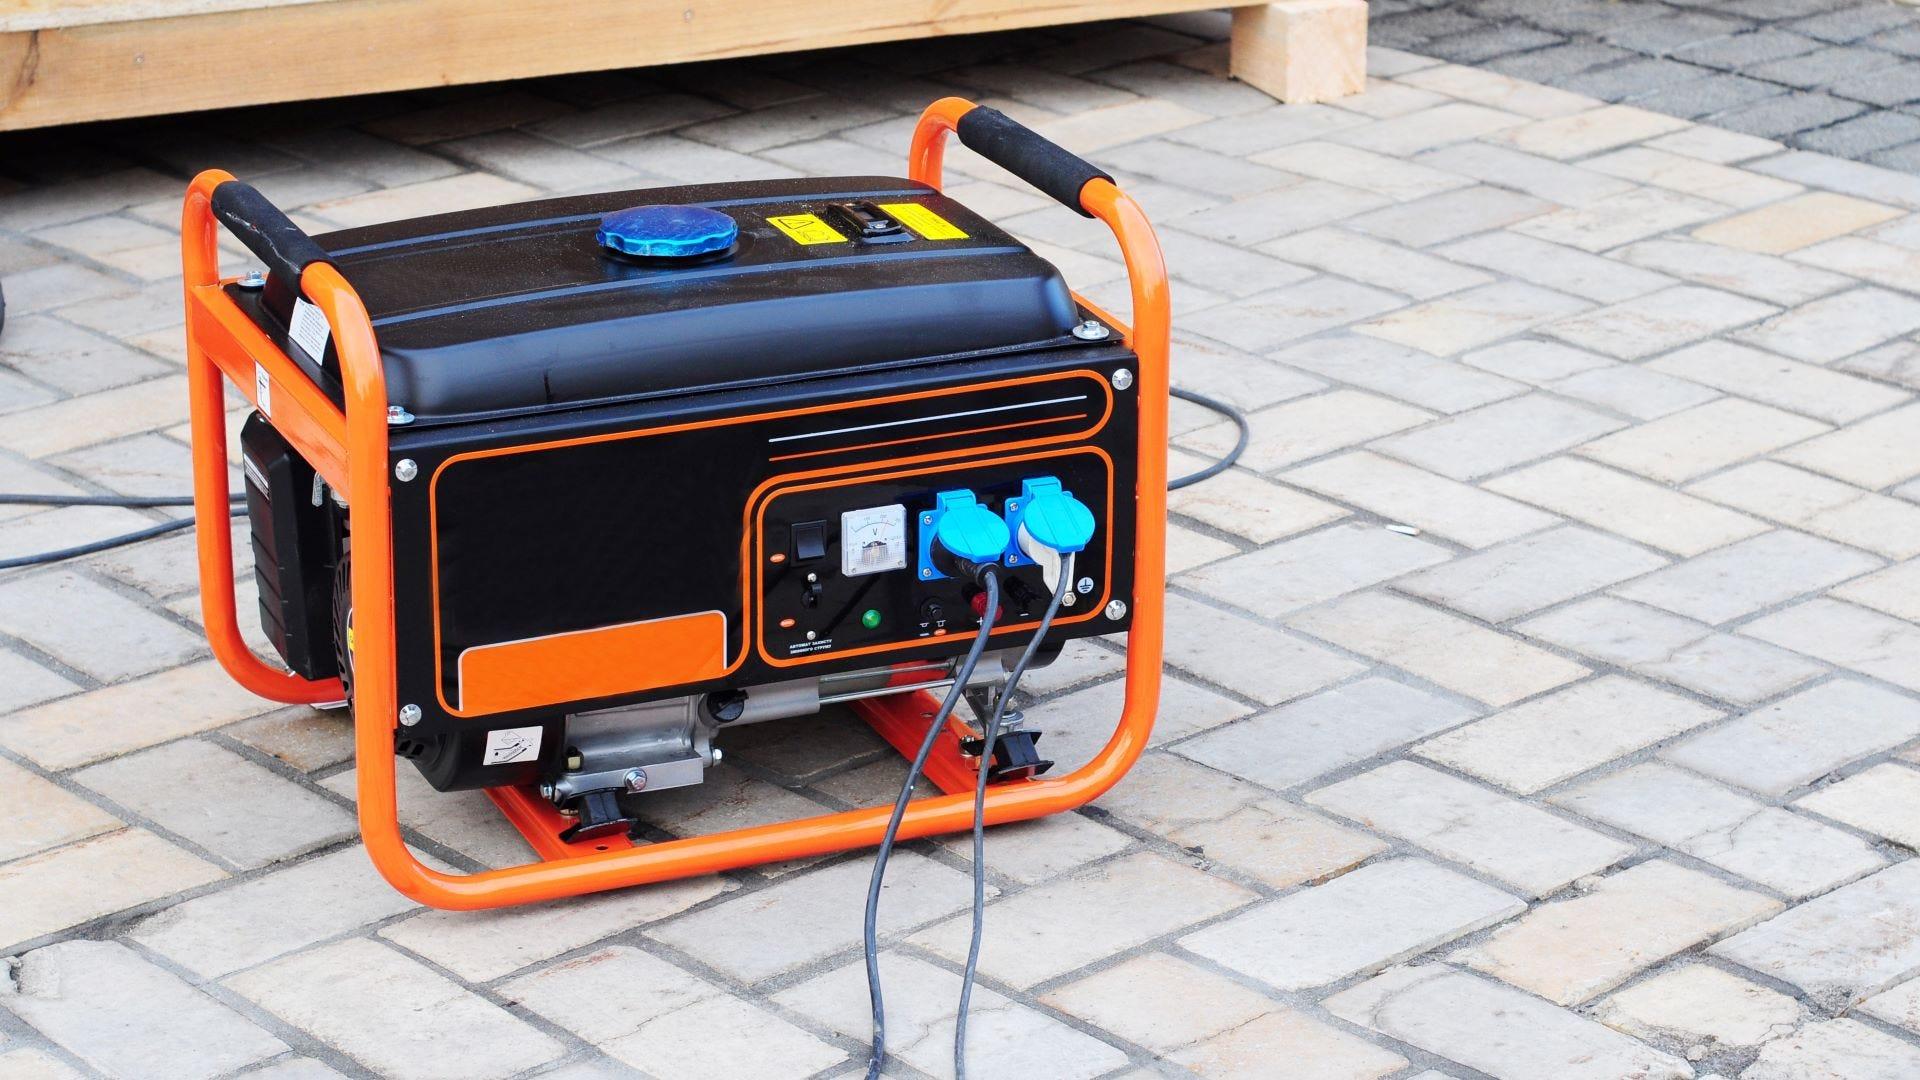 An orange generator sitting on a patio.